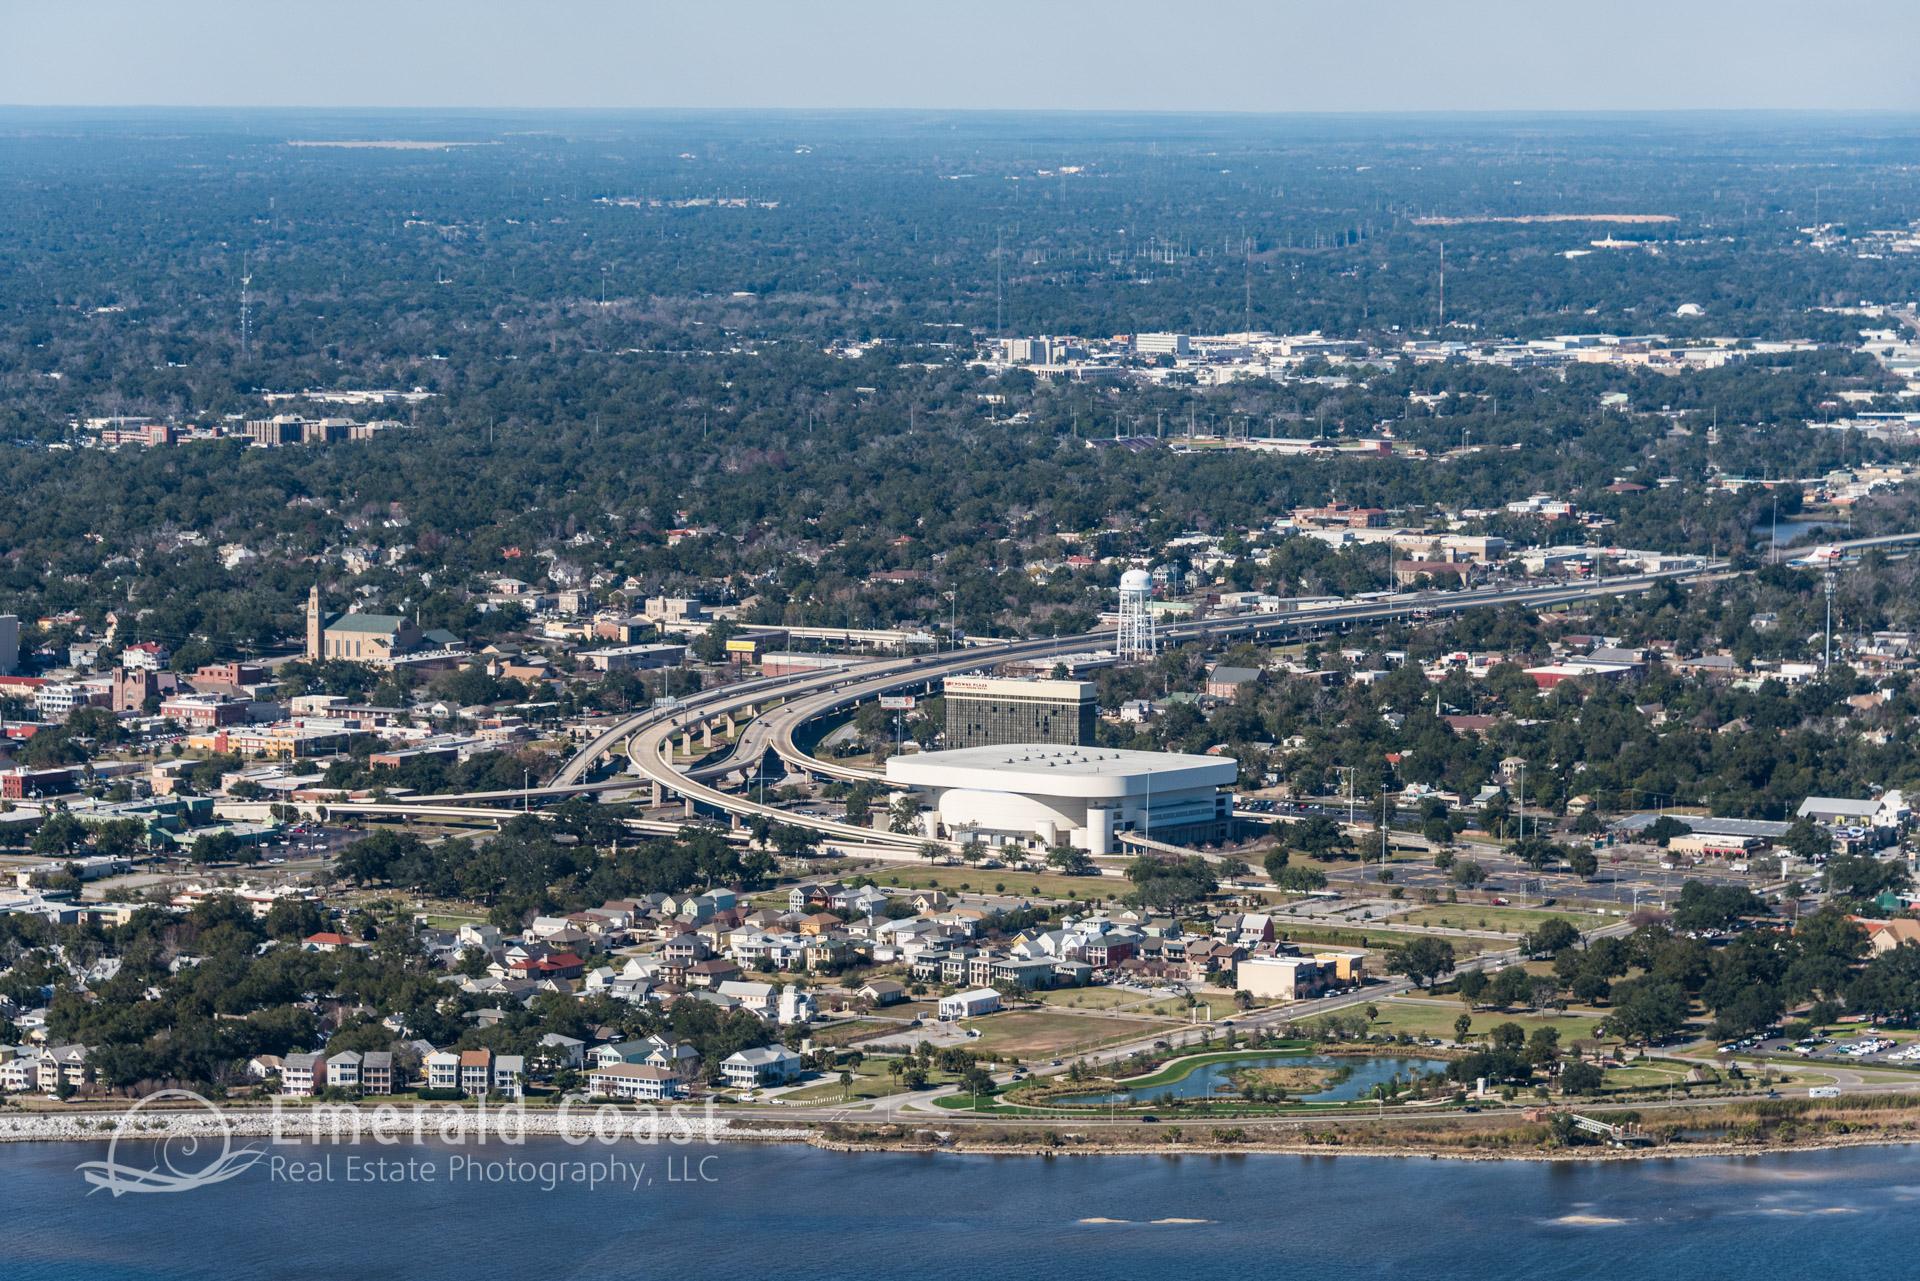 aerial view of Pensacola Bay Center